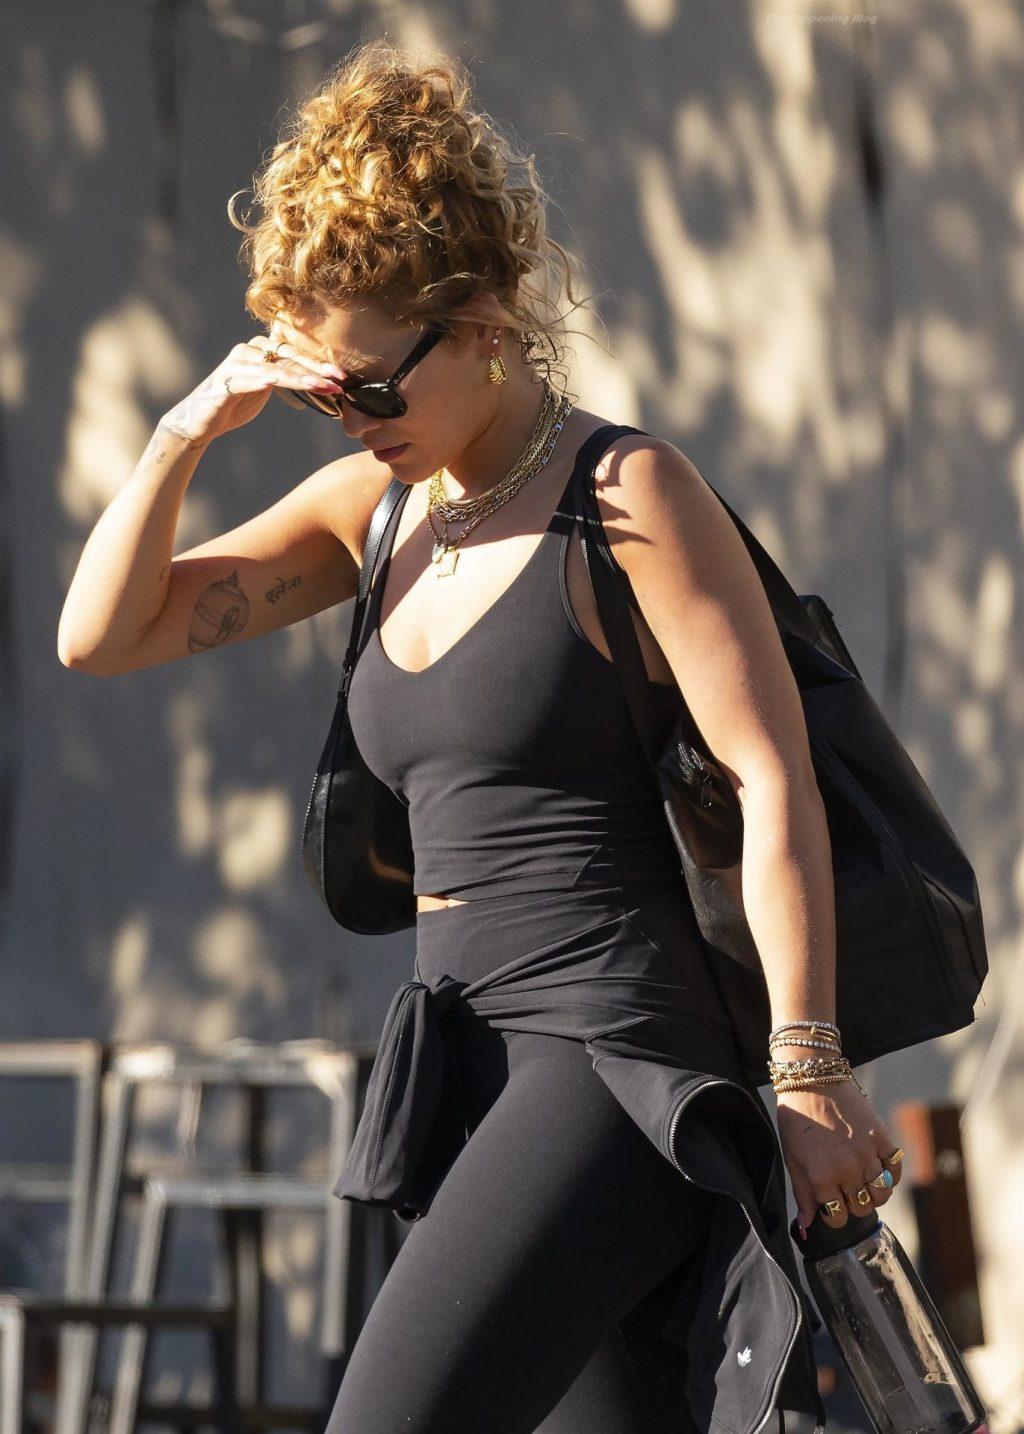 Rita Ora is Seen Leaving the Gym in Sydney (27 Photos)